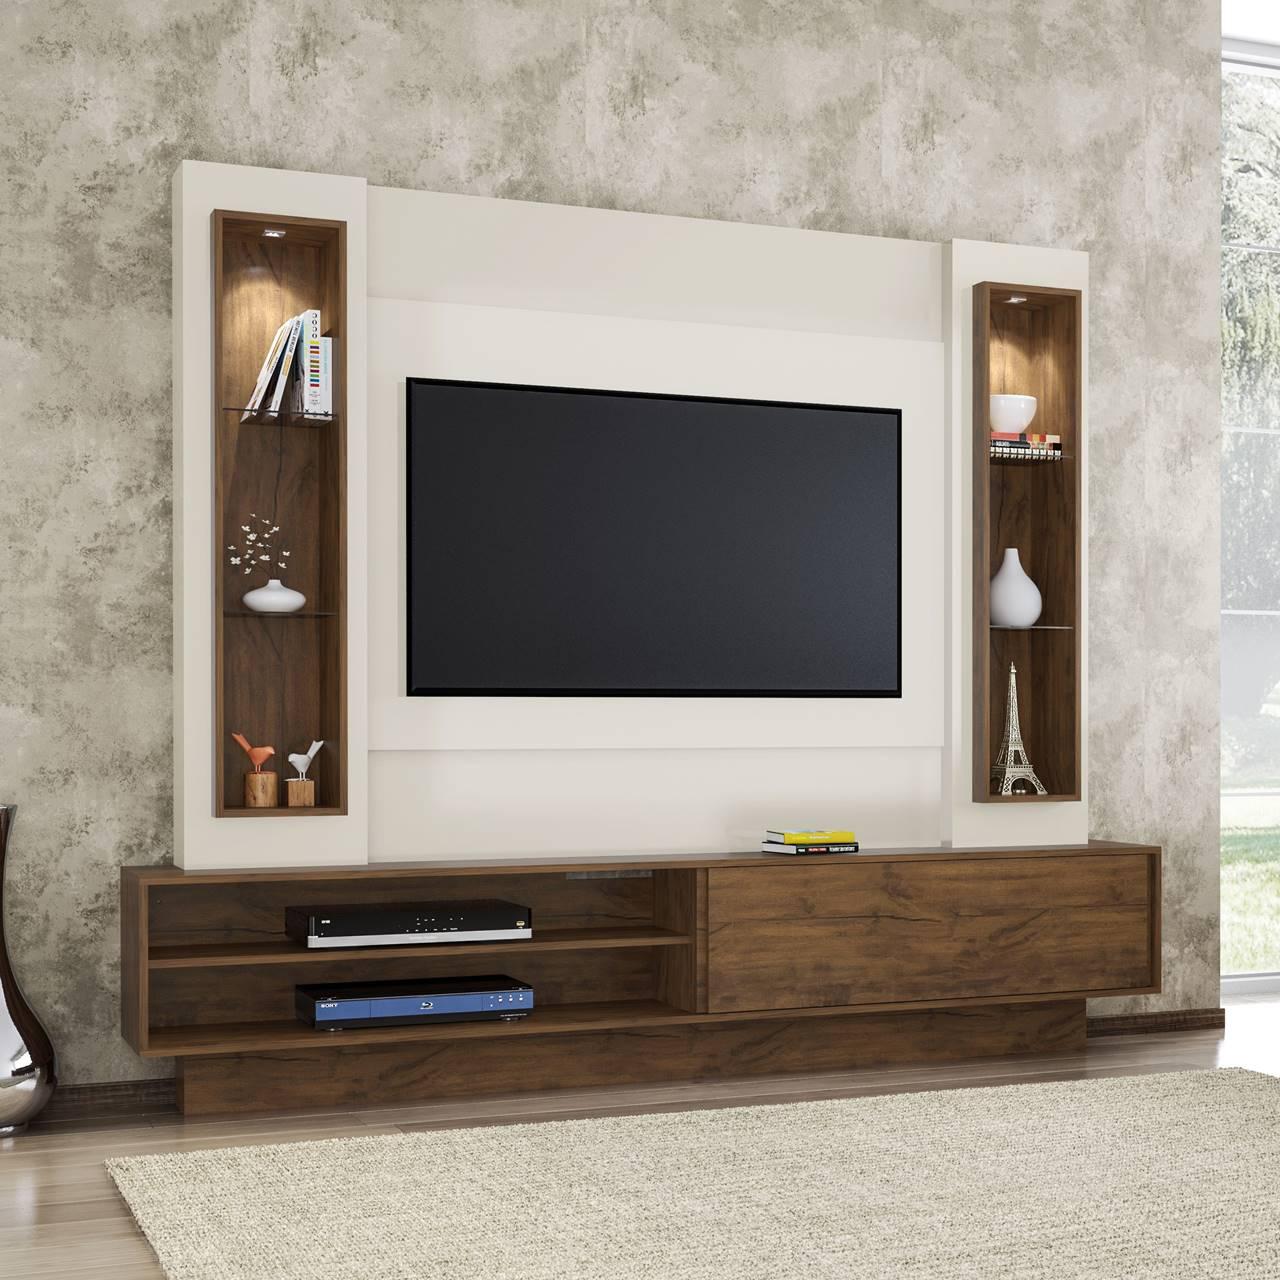 "Painel Home Suspenso p/ TV até 60"" com LED TB129L Dalla Costa Offwhite/Nobre"